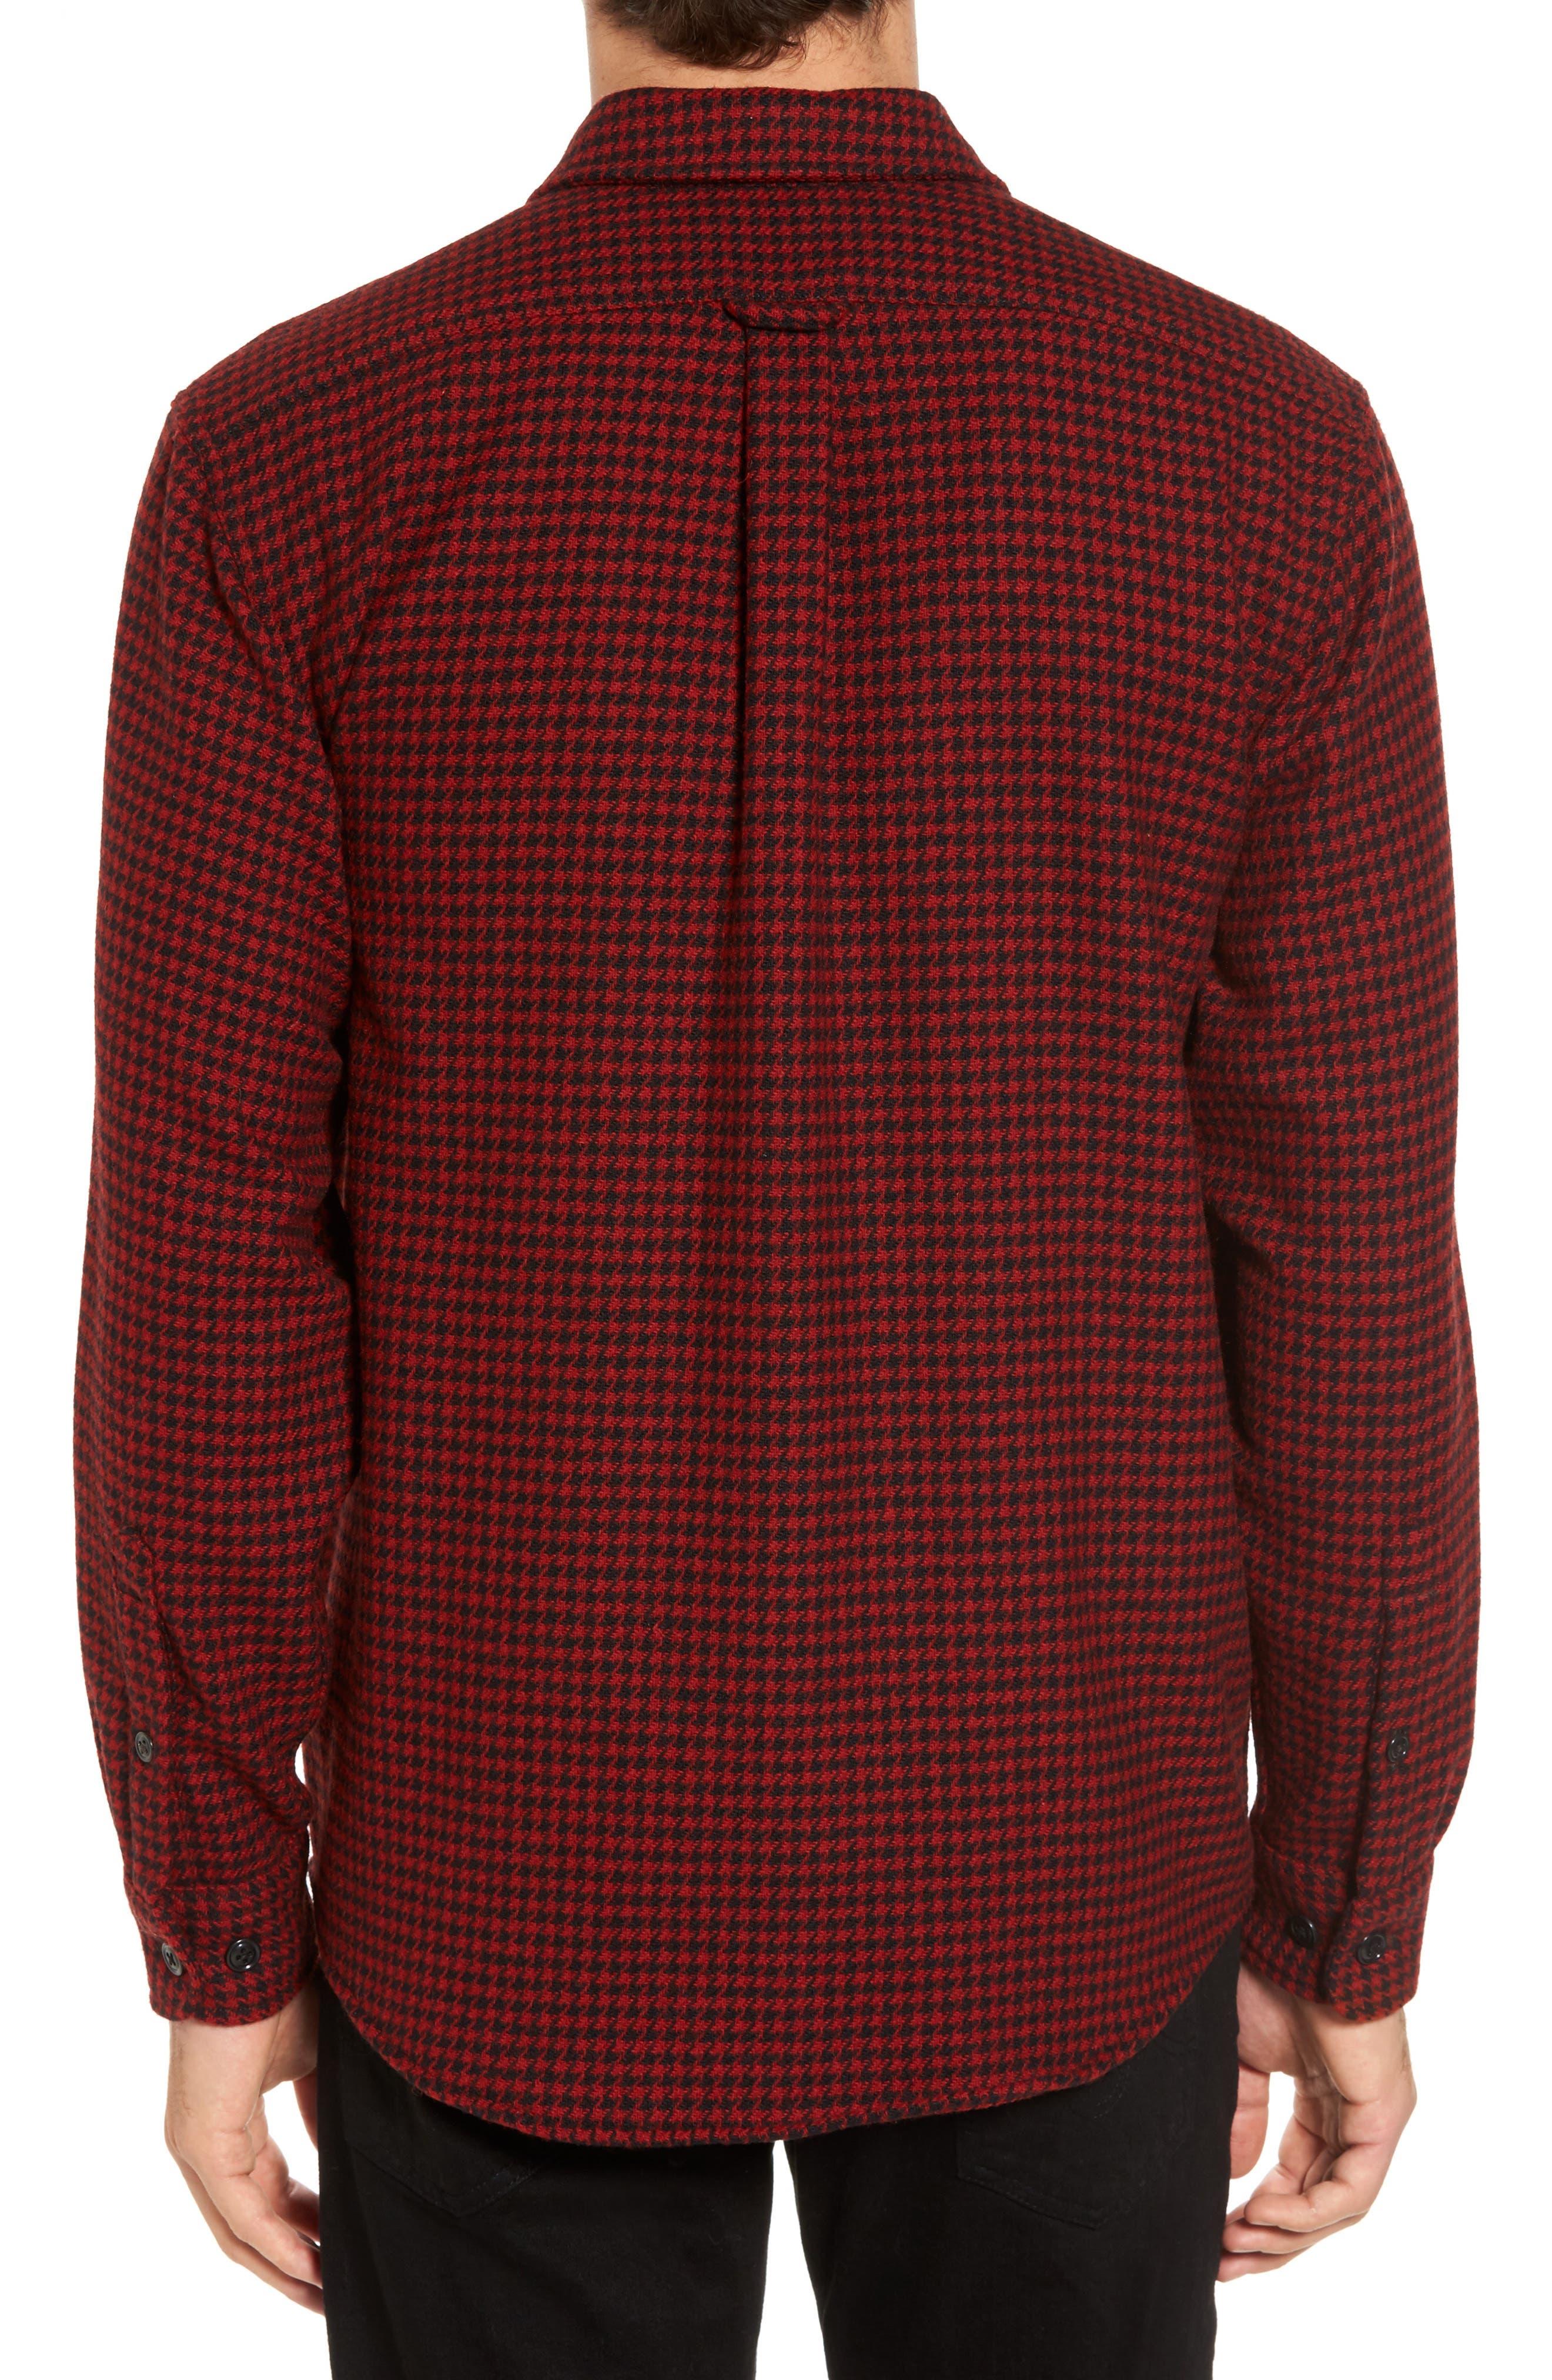 Northwest Houndstooth Shirt Jacket,                             Alternate thumbnail 2, color,                             645